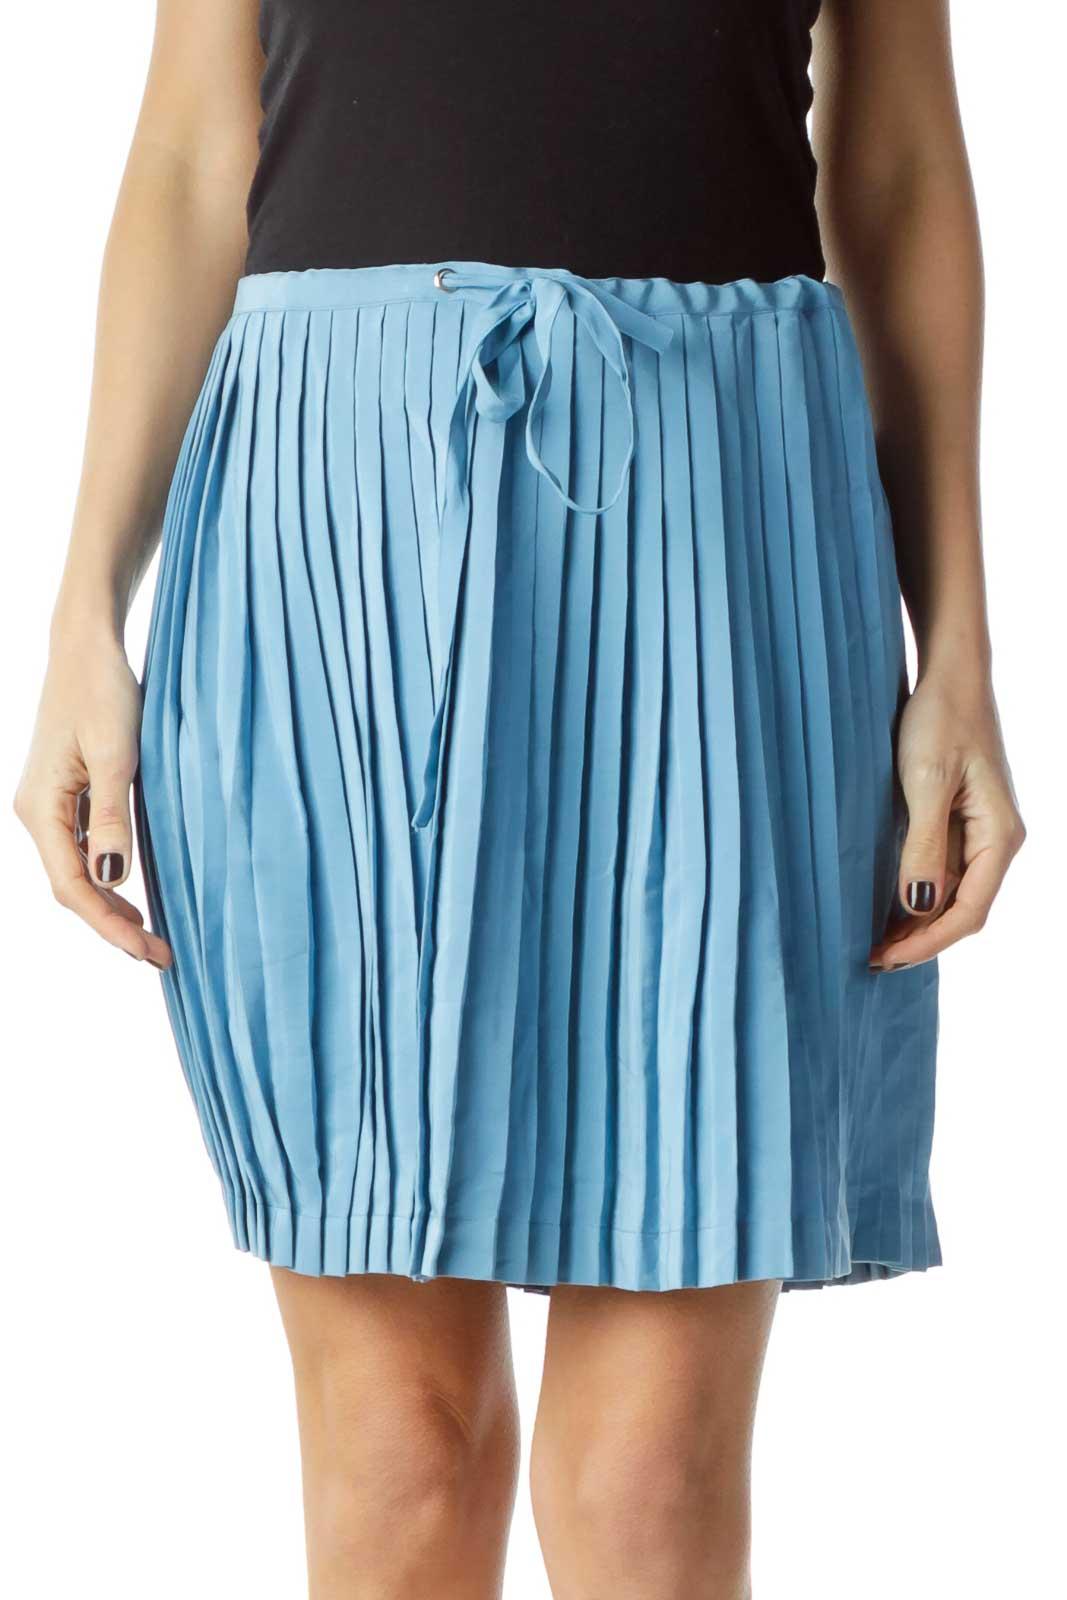 Blue Pleated Mini Skirt Front